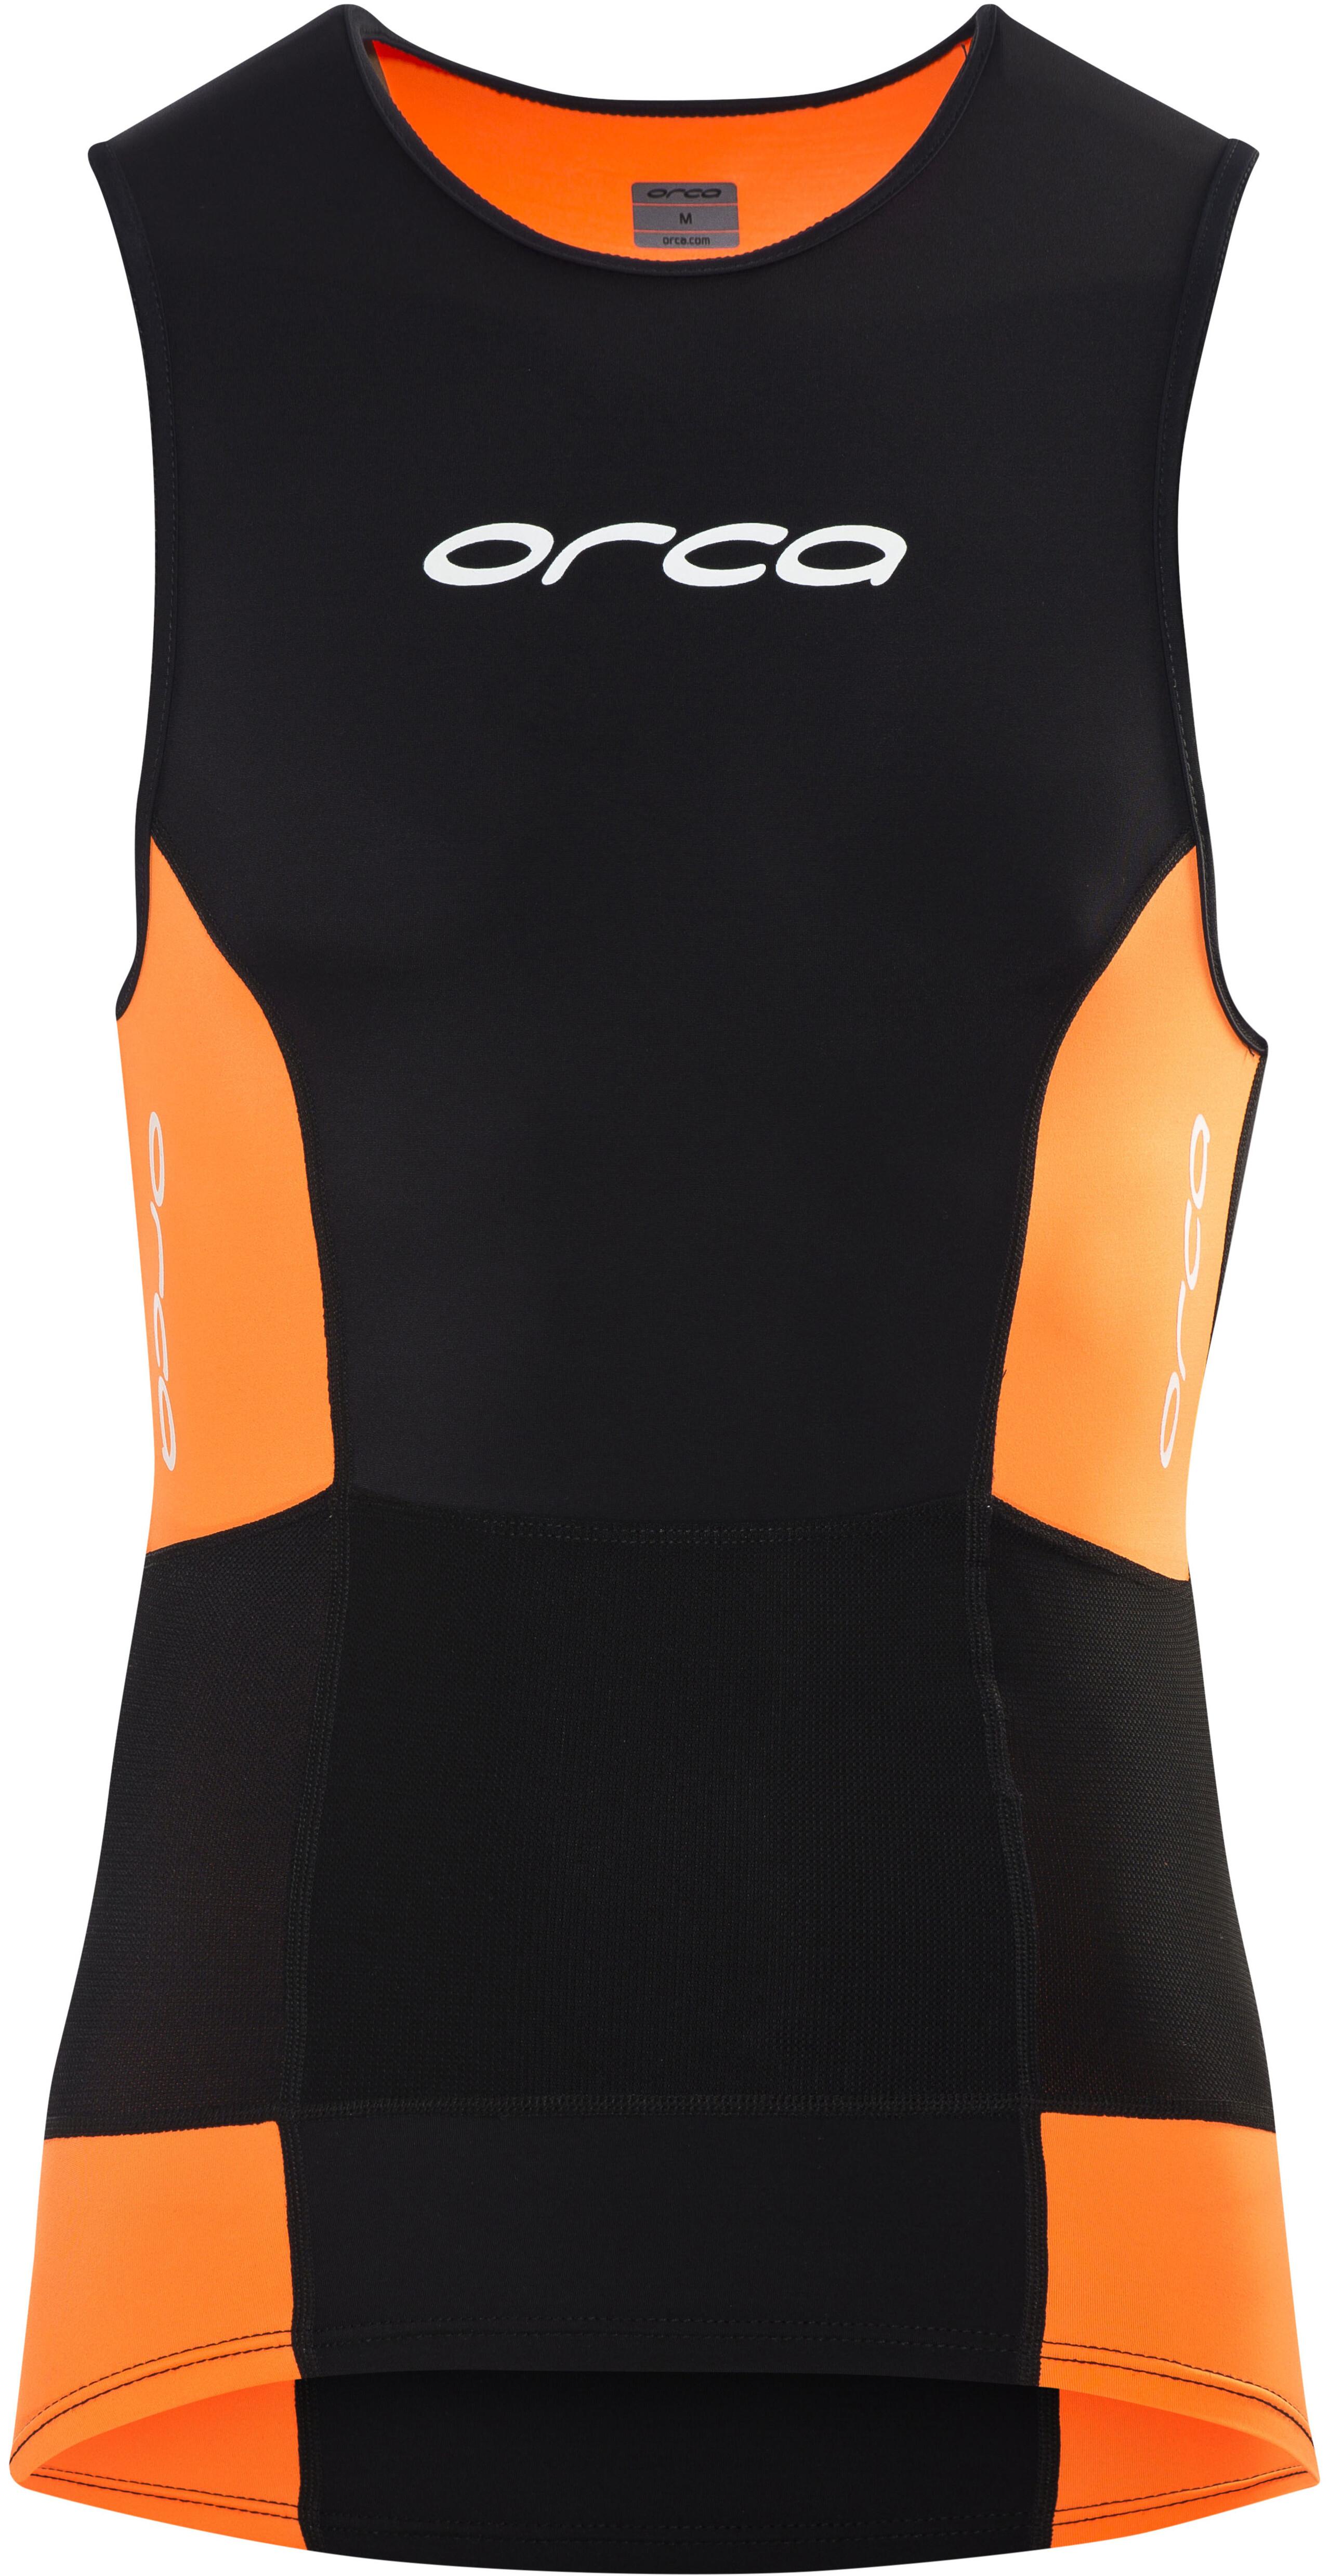 9ddc3bf559 ORCA SwimRun orange black at Addnature.co.uk